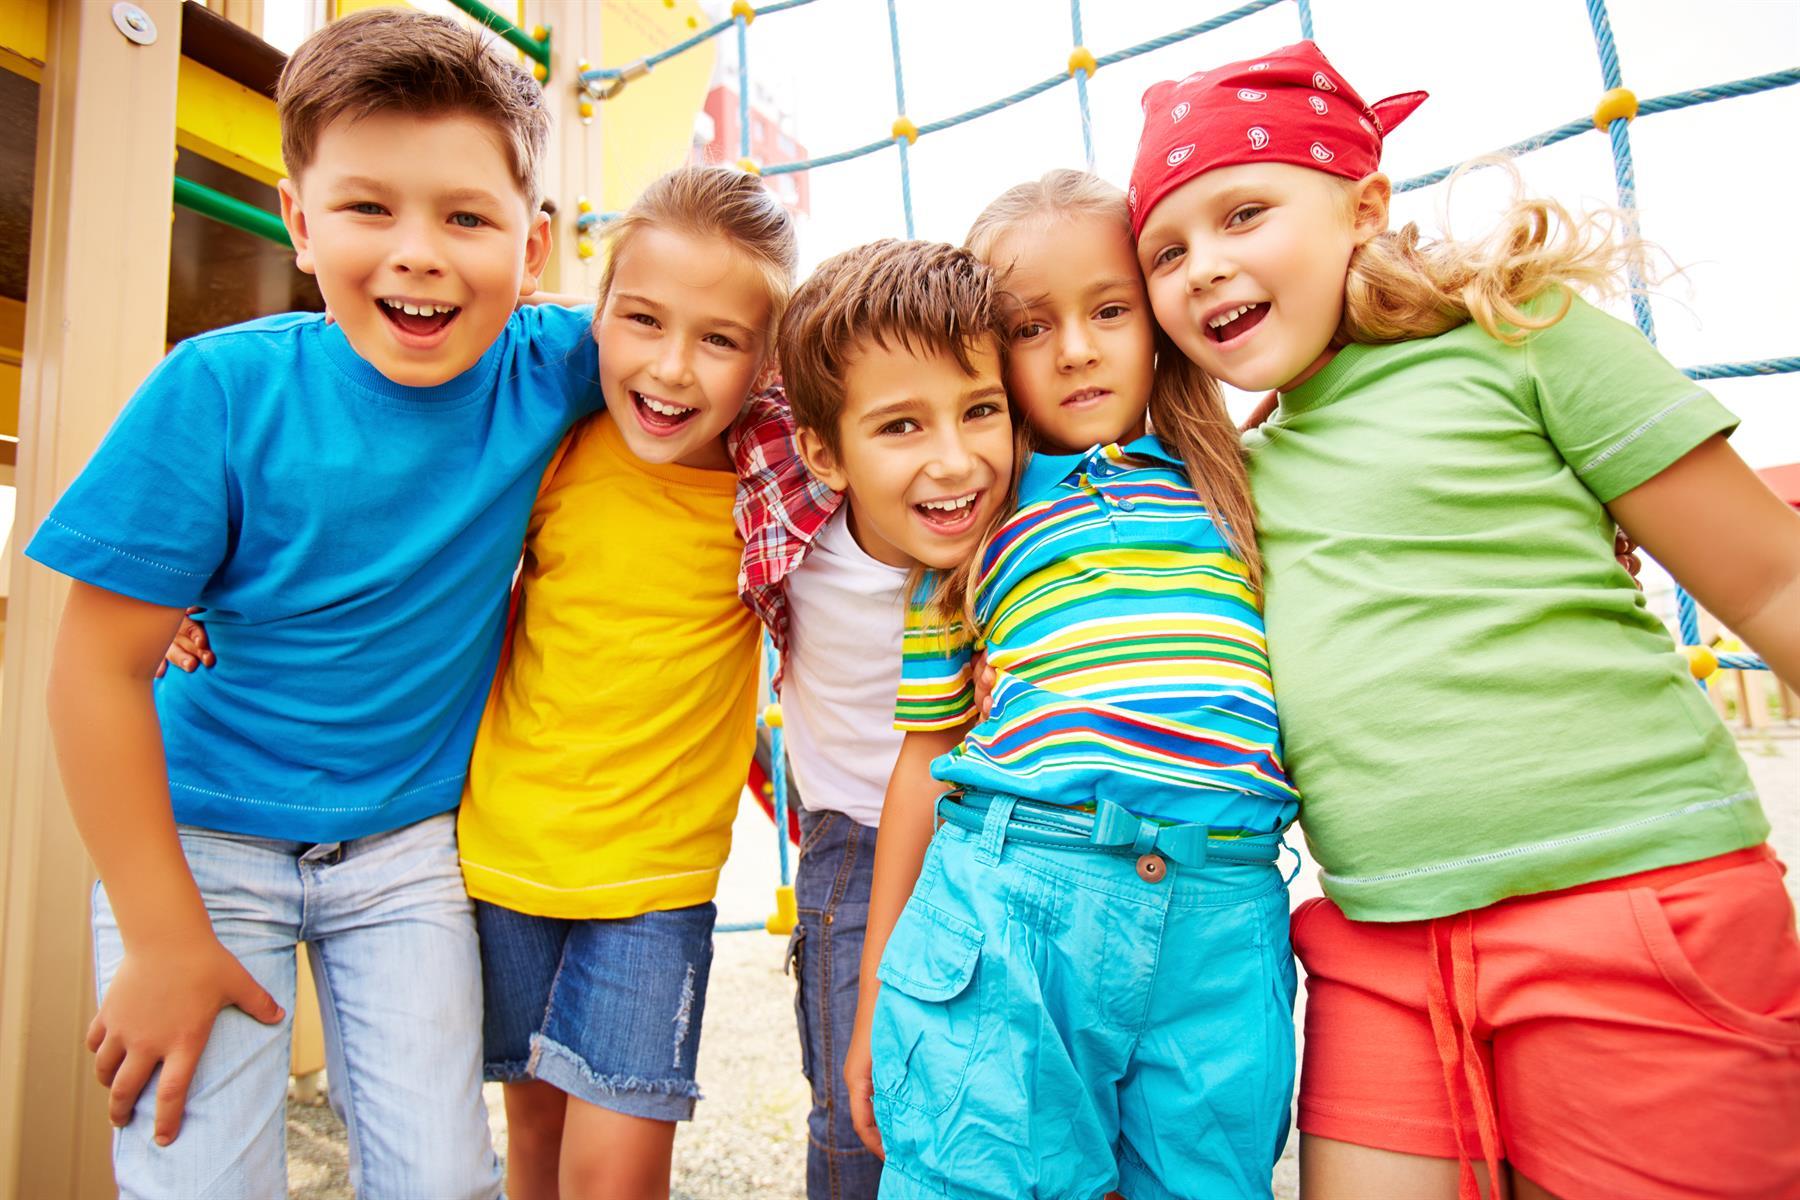 дети_bērni_children-w1800